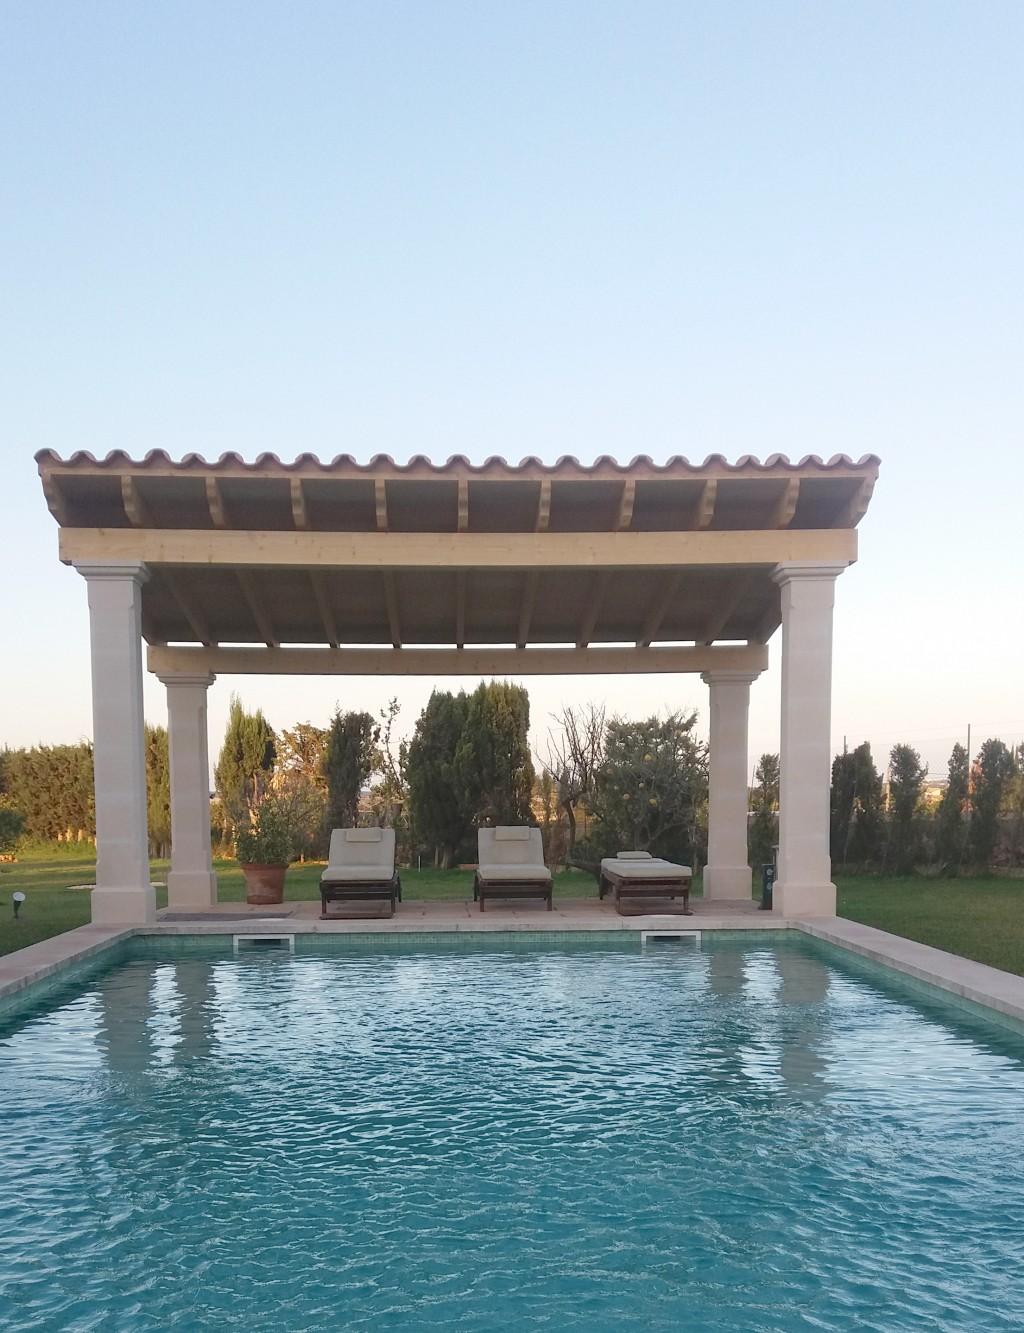 Pool 10 x 5 m